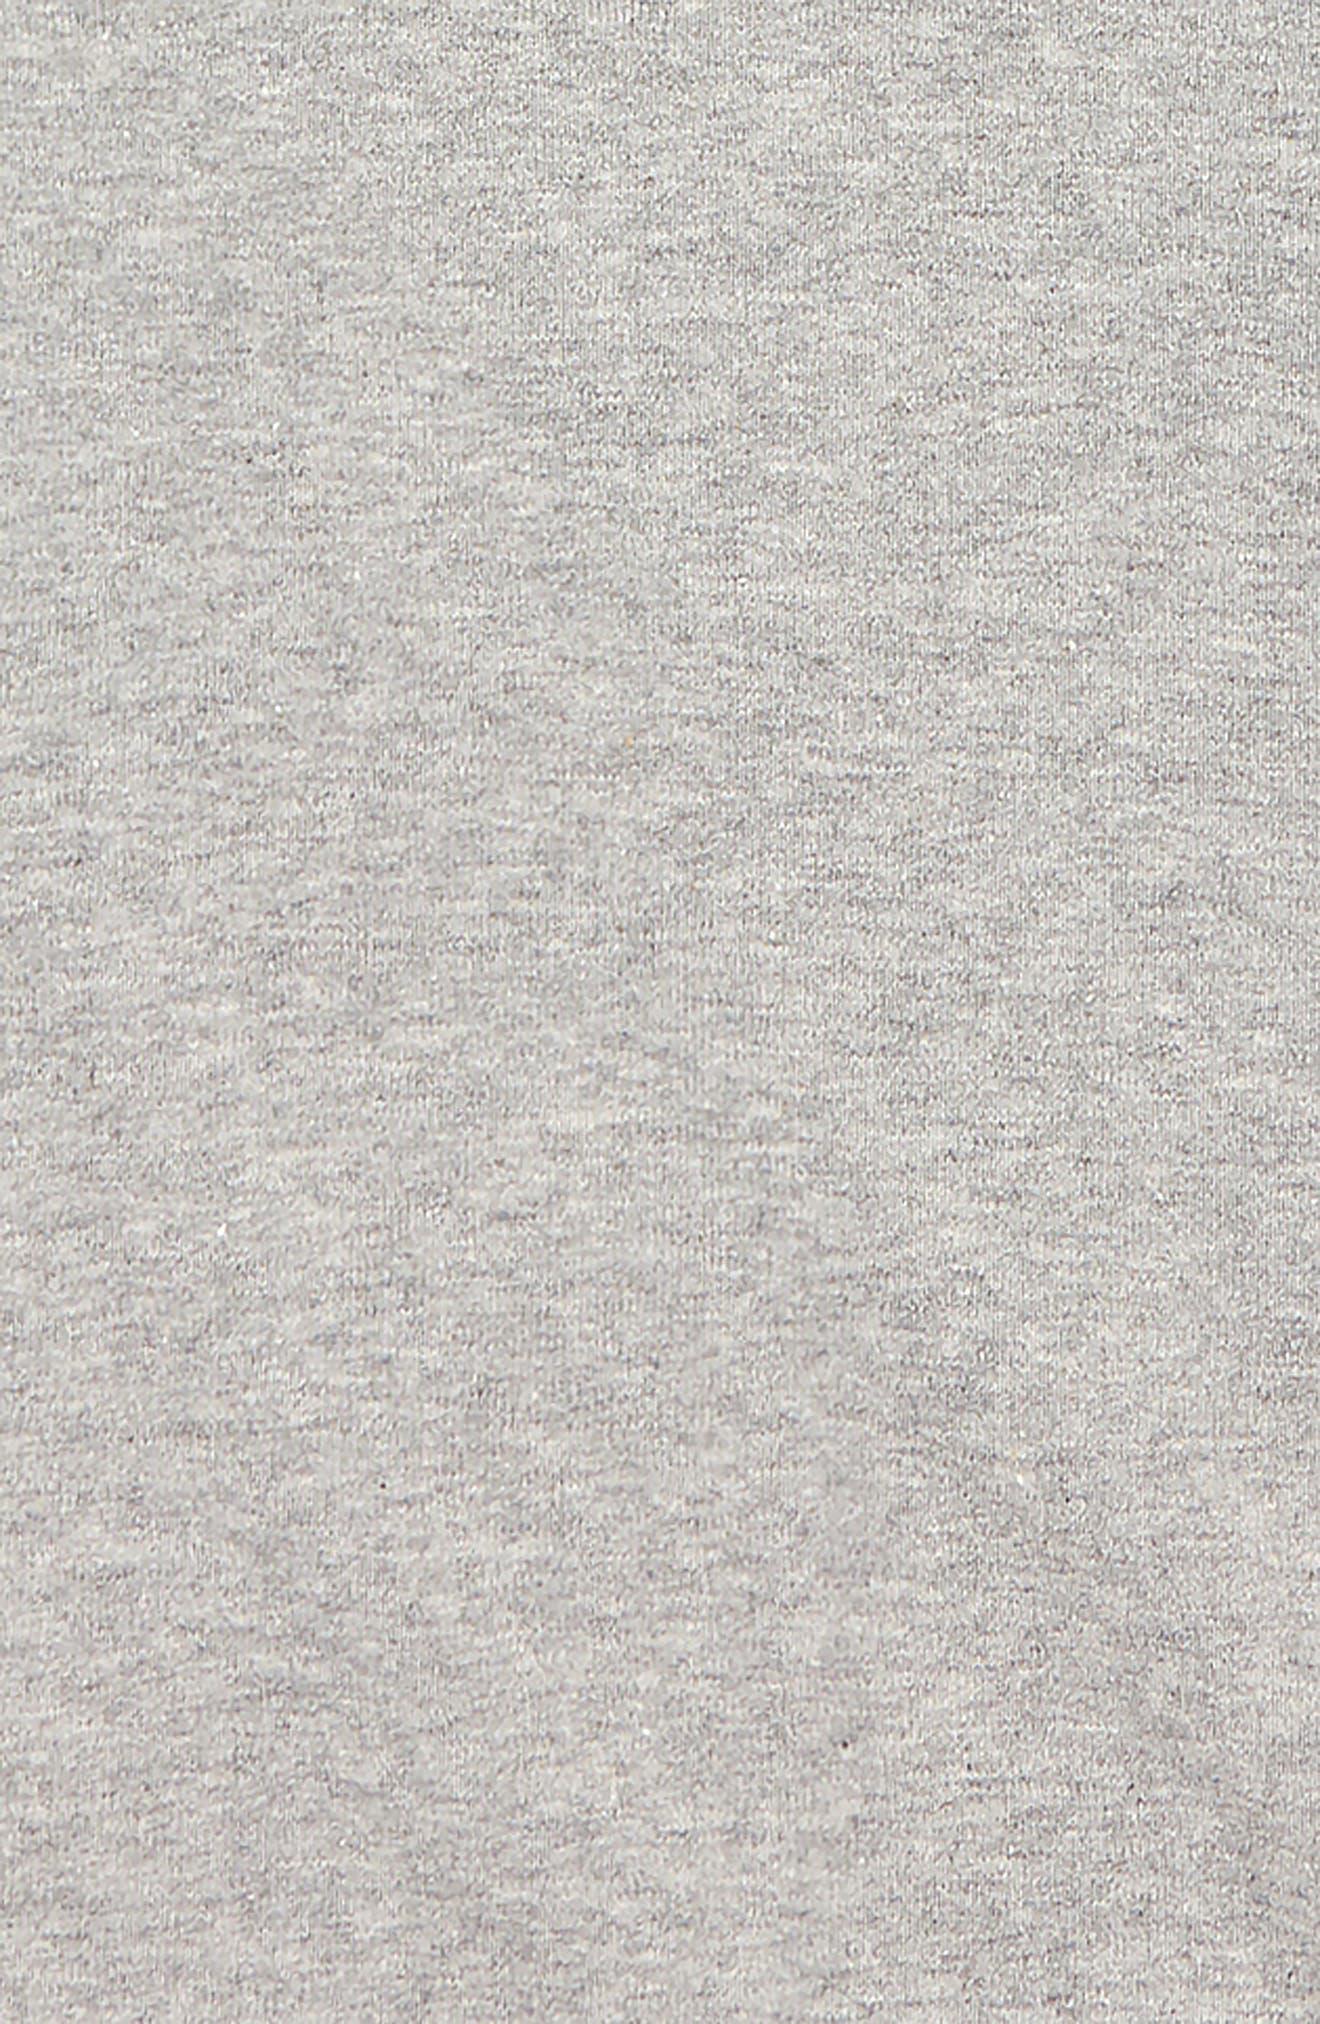 Ninja Hooded Shirt,                             Alternate thumbnail 2, color,                             HEATHER GREY